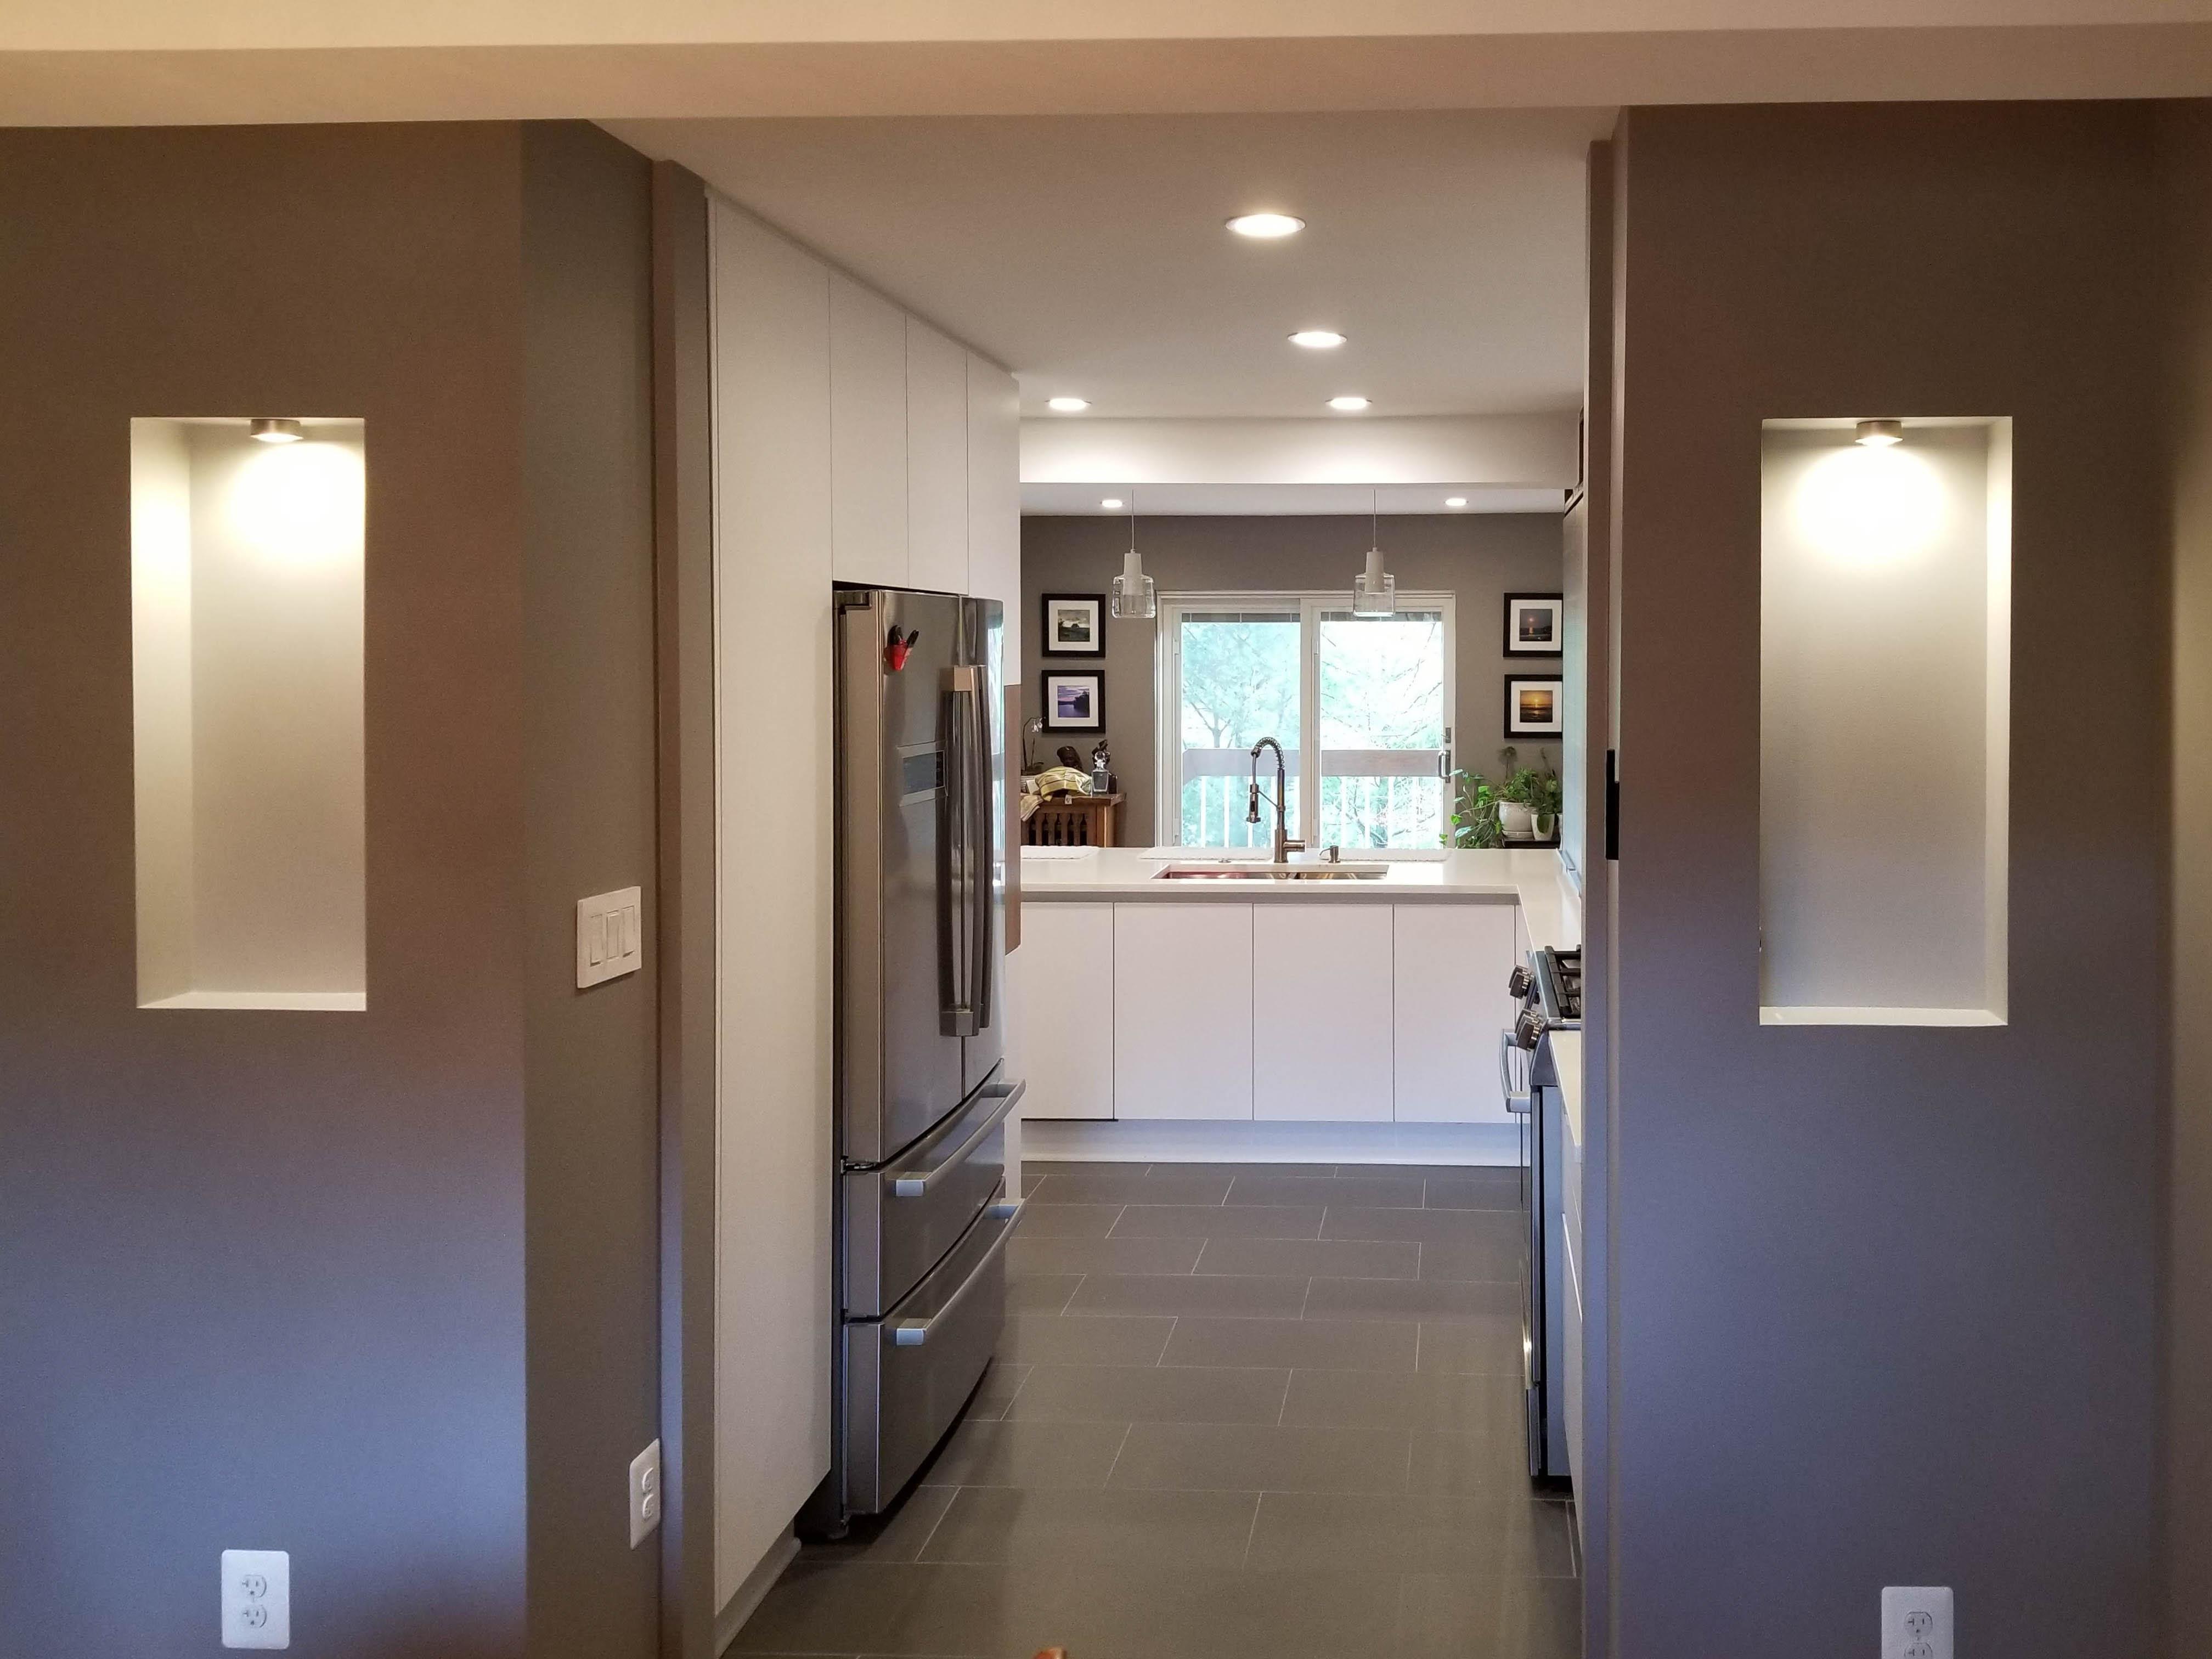 Fairfax VA Kitchen Remodeling